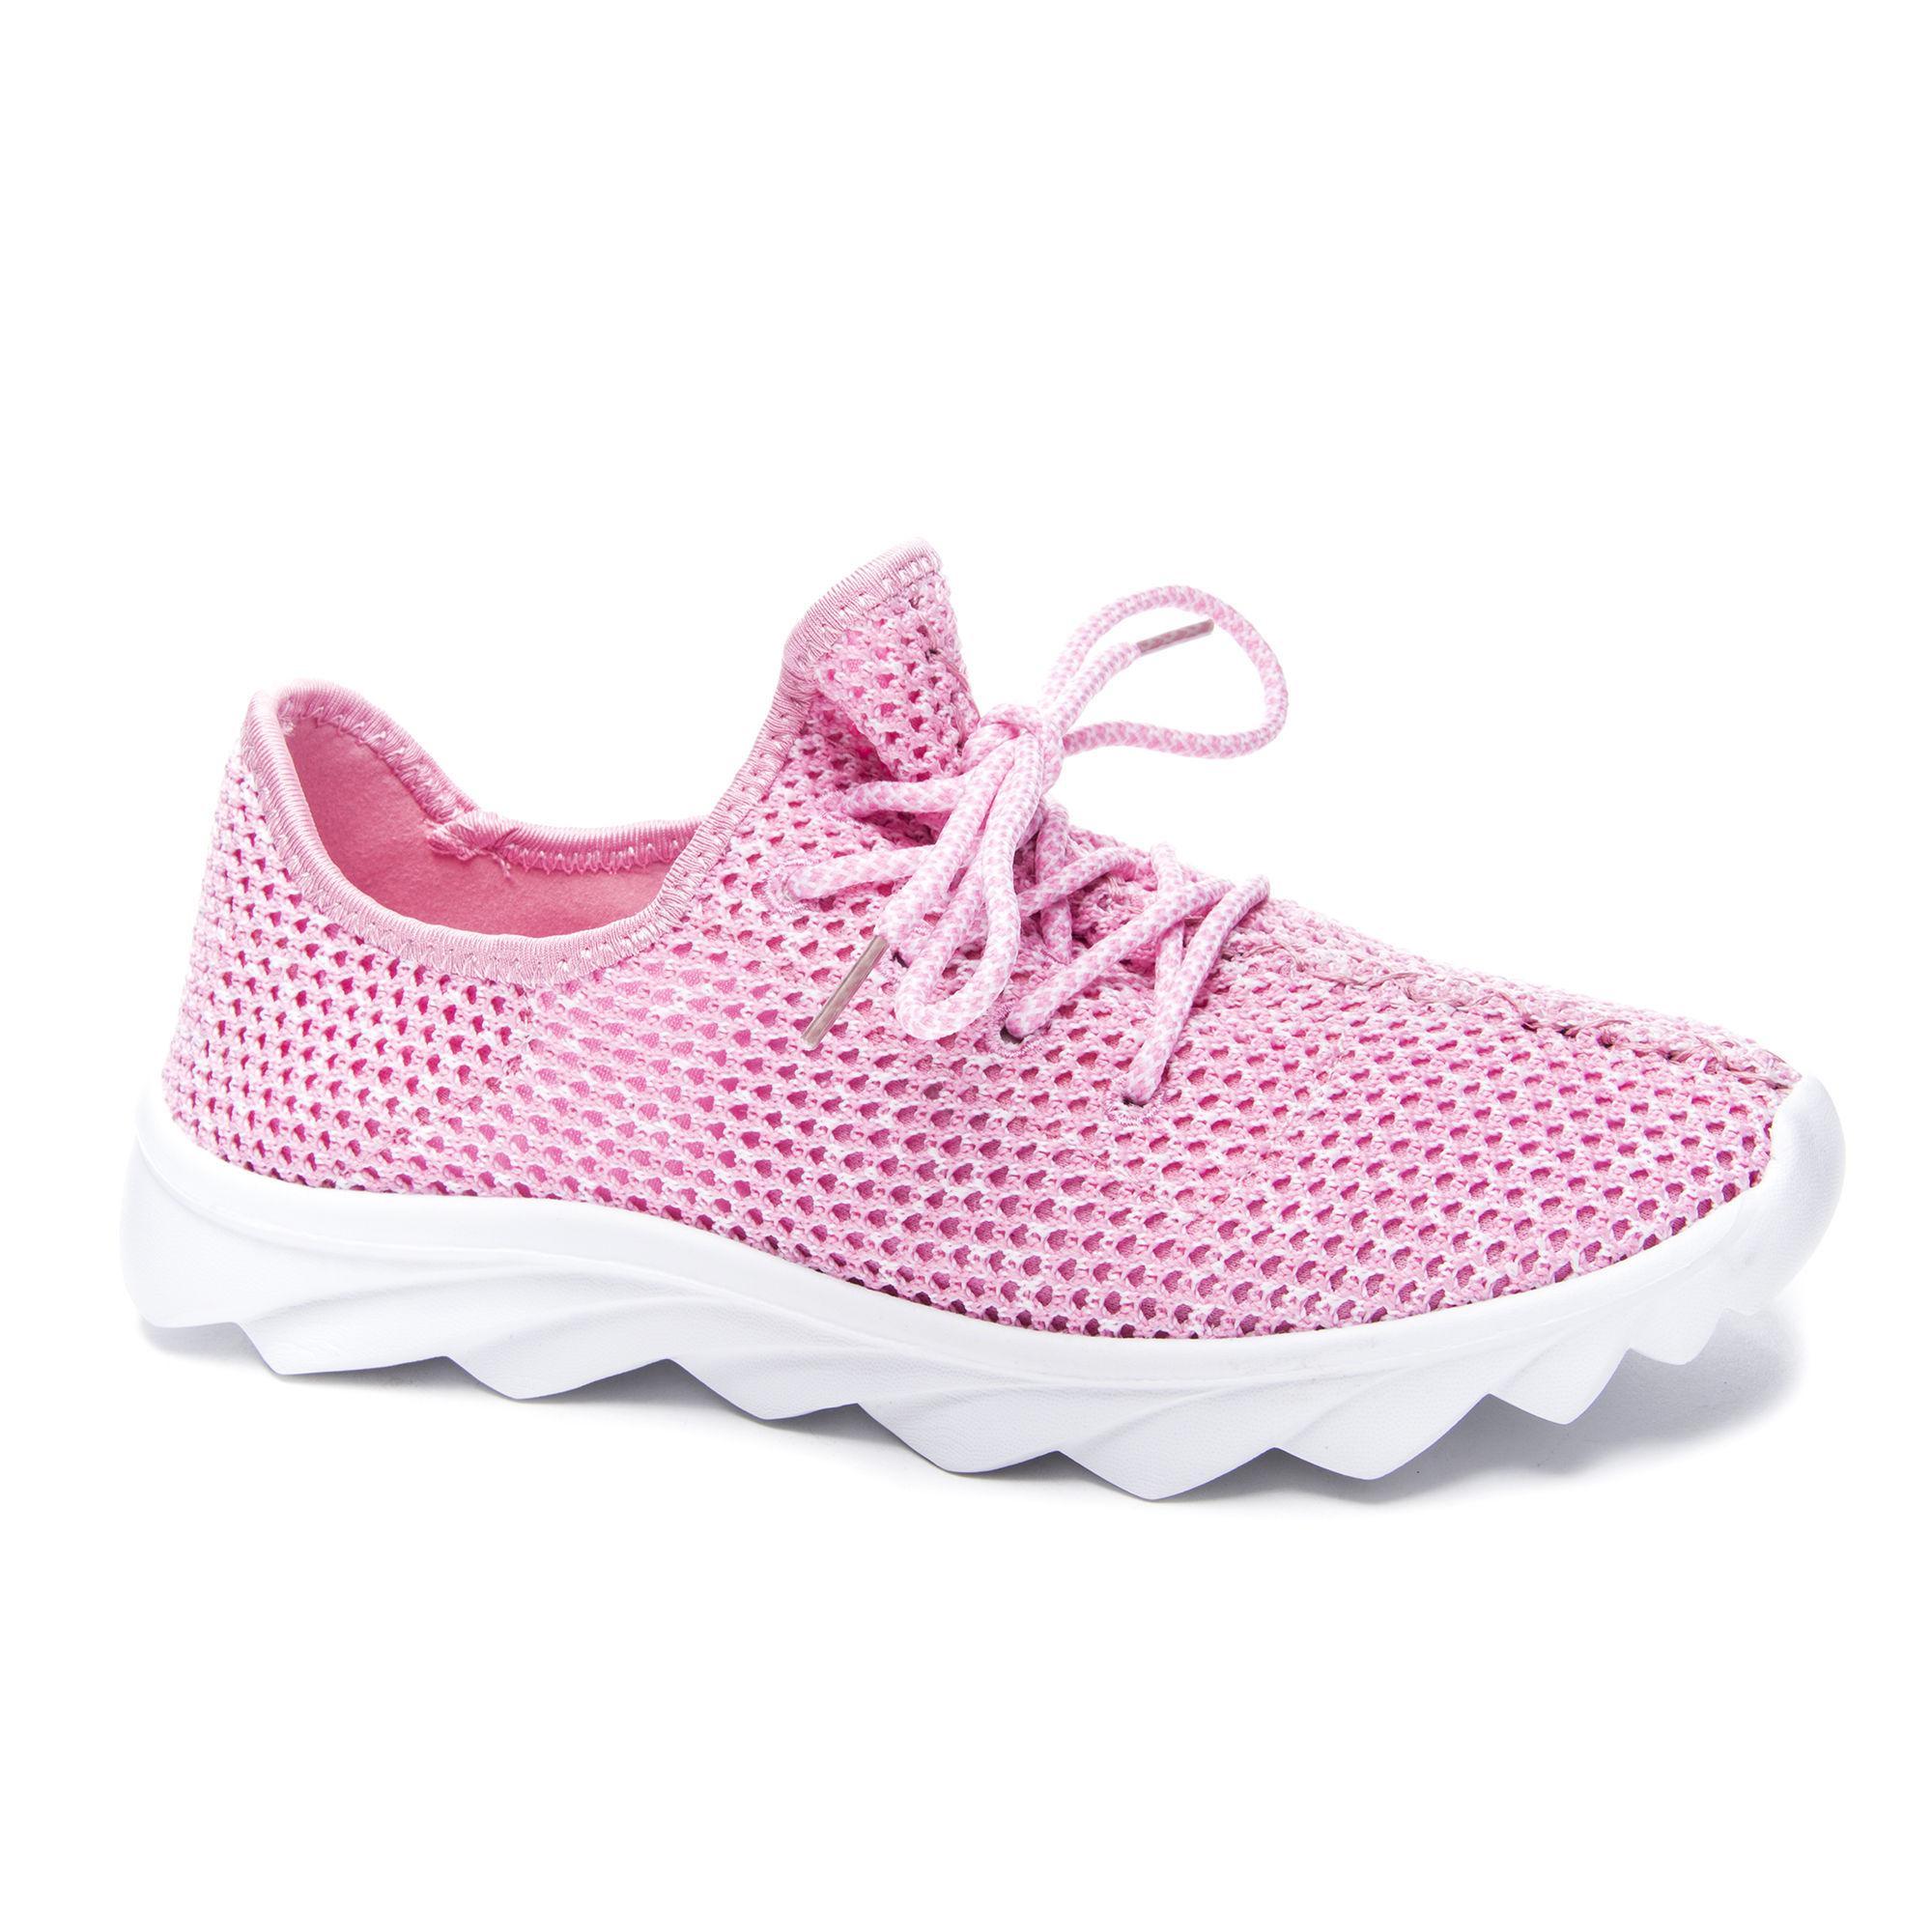 2bbef9cf Dirty Laundry Serene Mesh Sneaker in Pink - Lyst